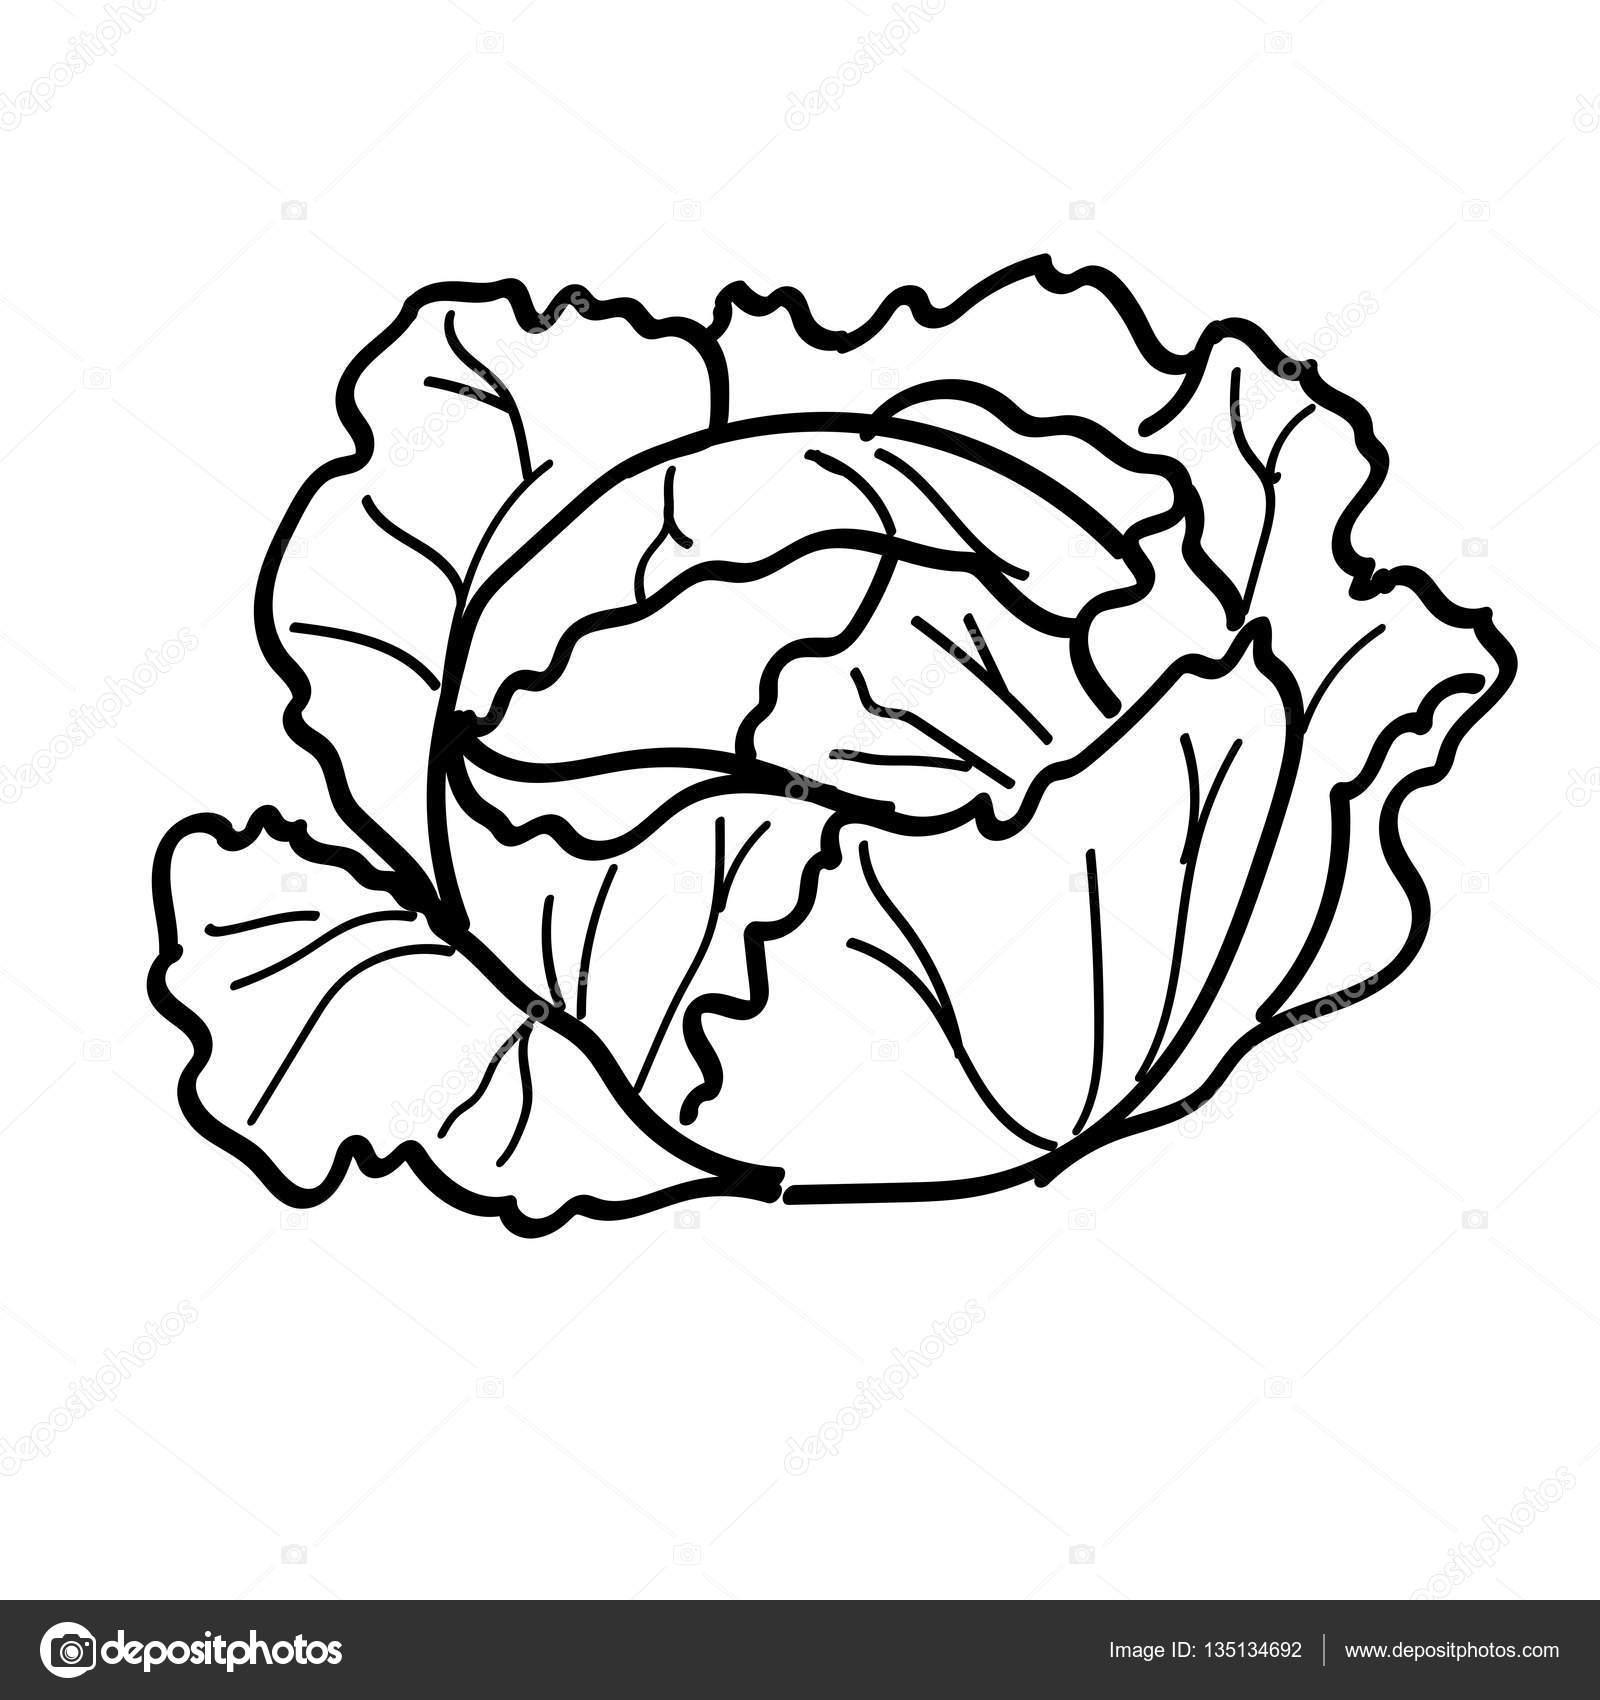 Cabbage Drawing At Getdrawings